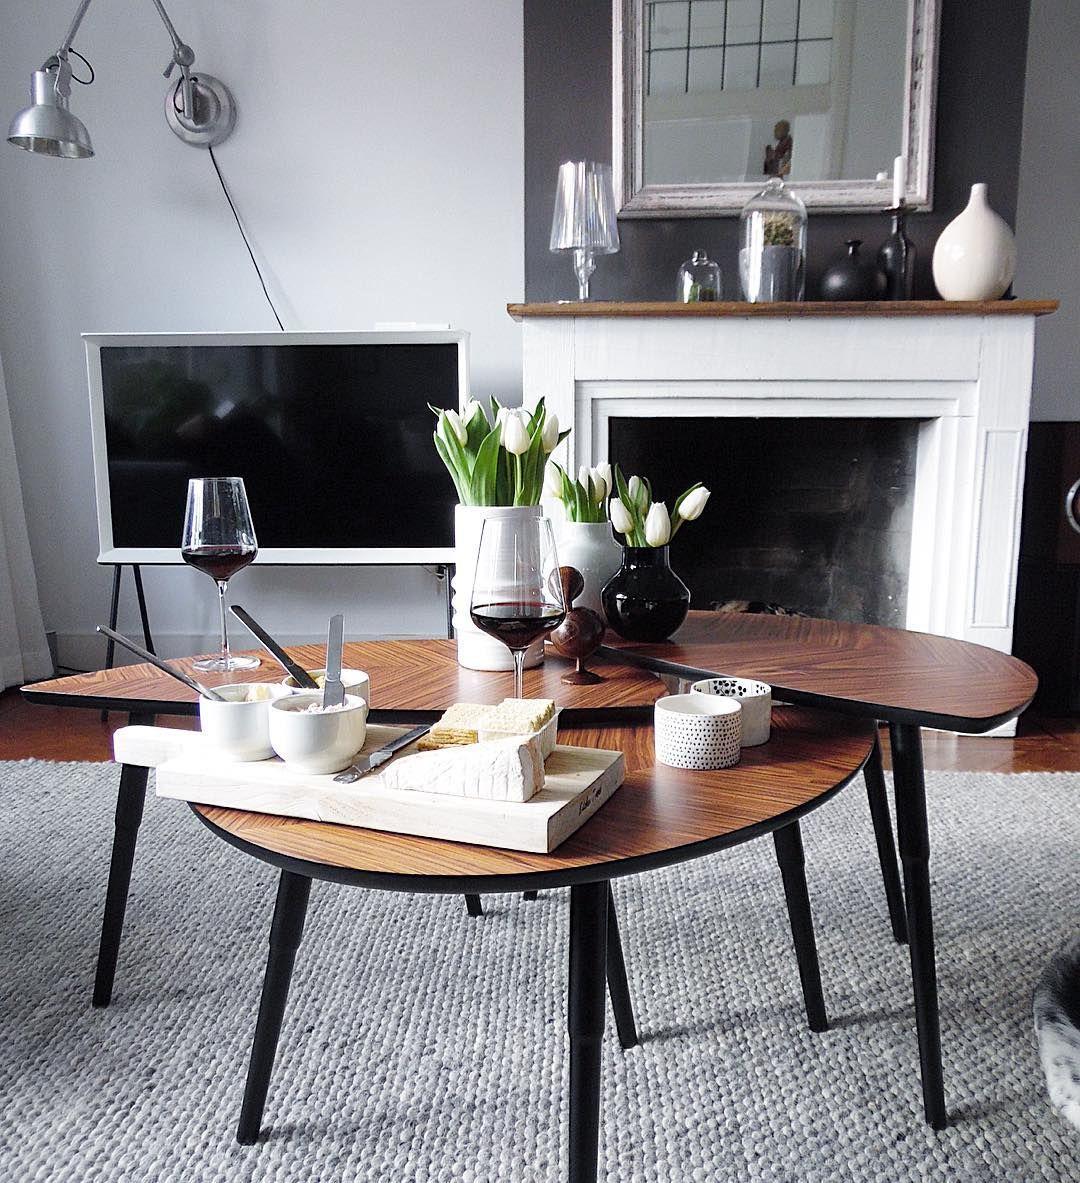 Ikea 'Lövbacken' Retro Side Tables @charlottevanwelsem